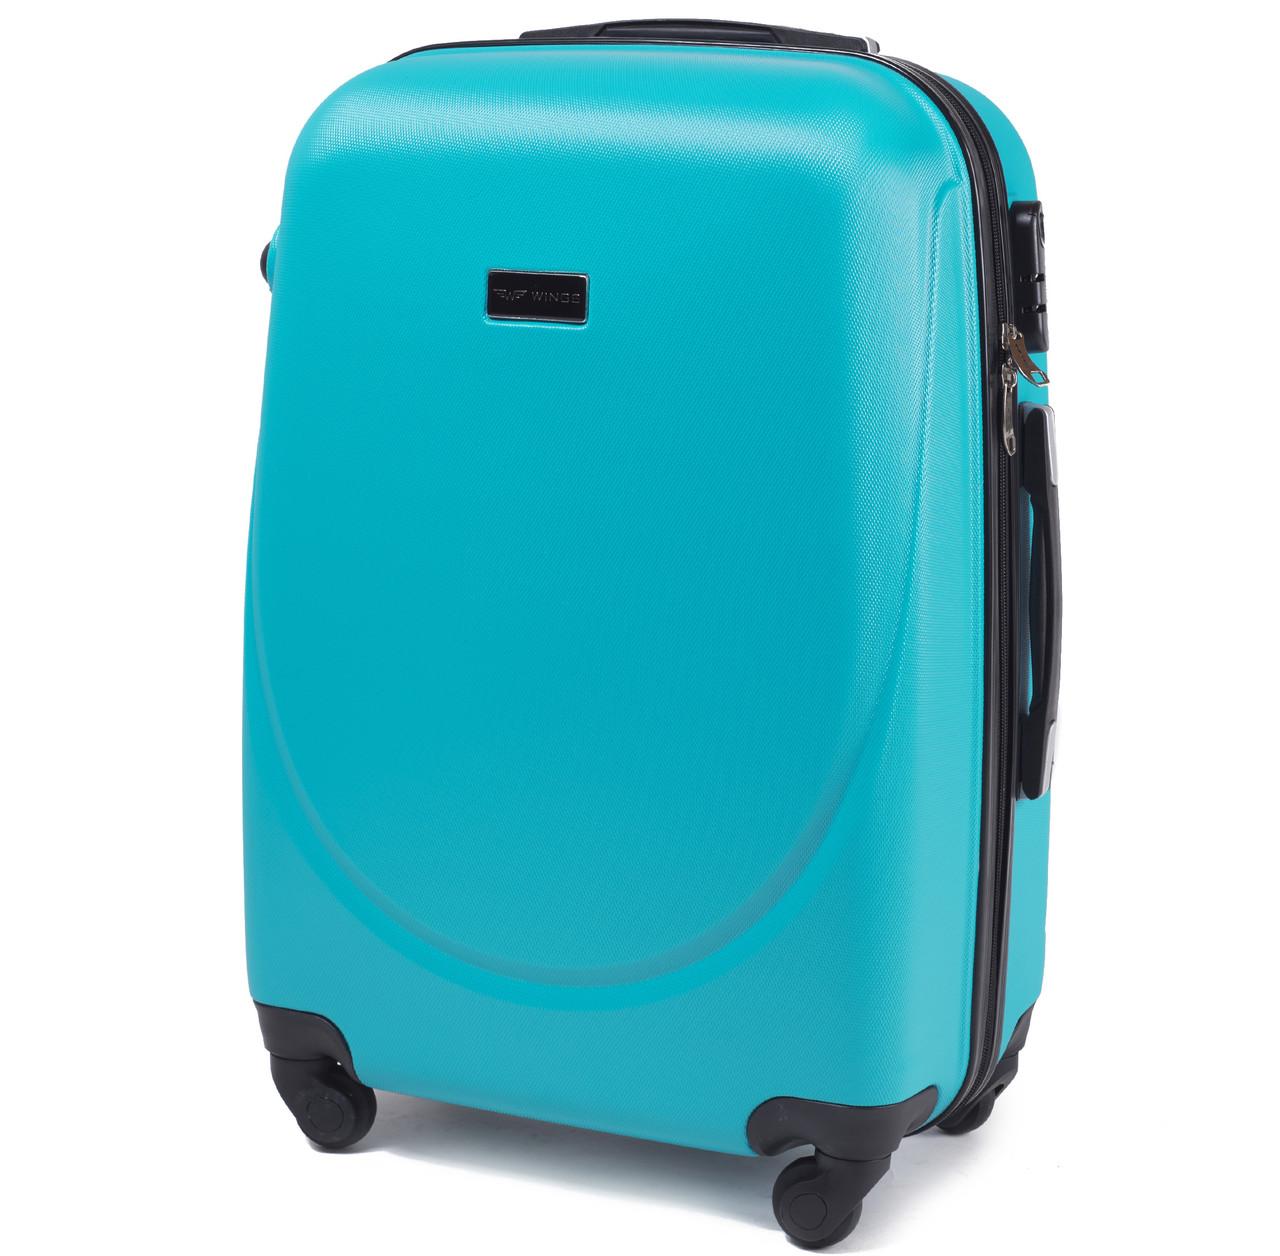 27fbdc25bb30 Средний пластиковый чемодан Wings 310 на 4 колесах - Best Bag в Николаеве